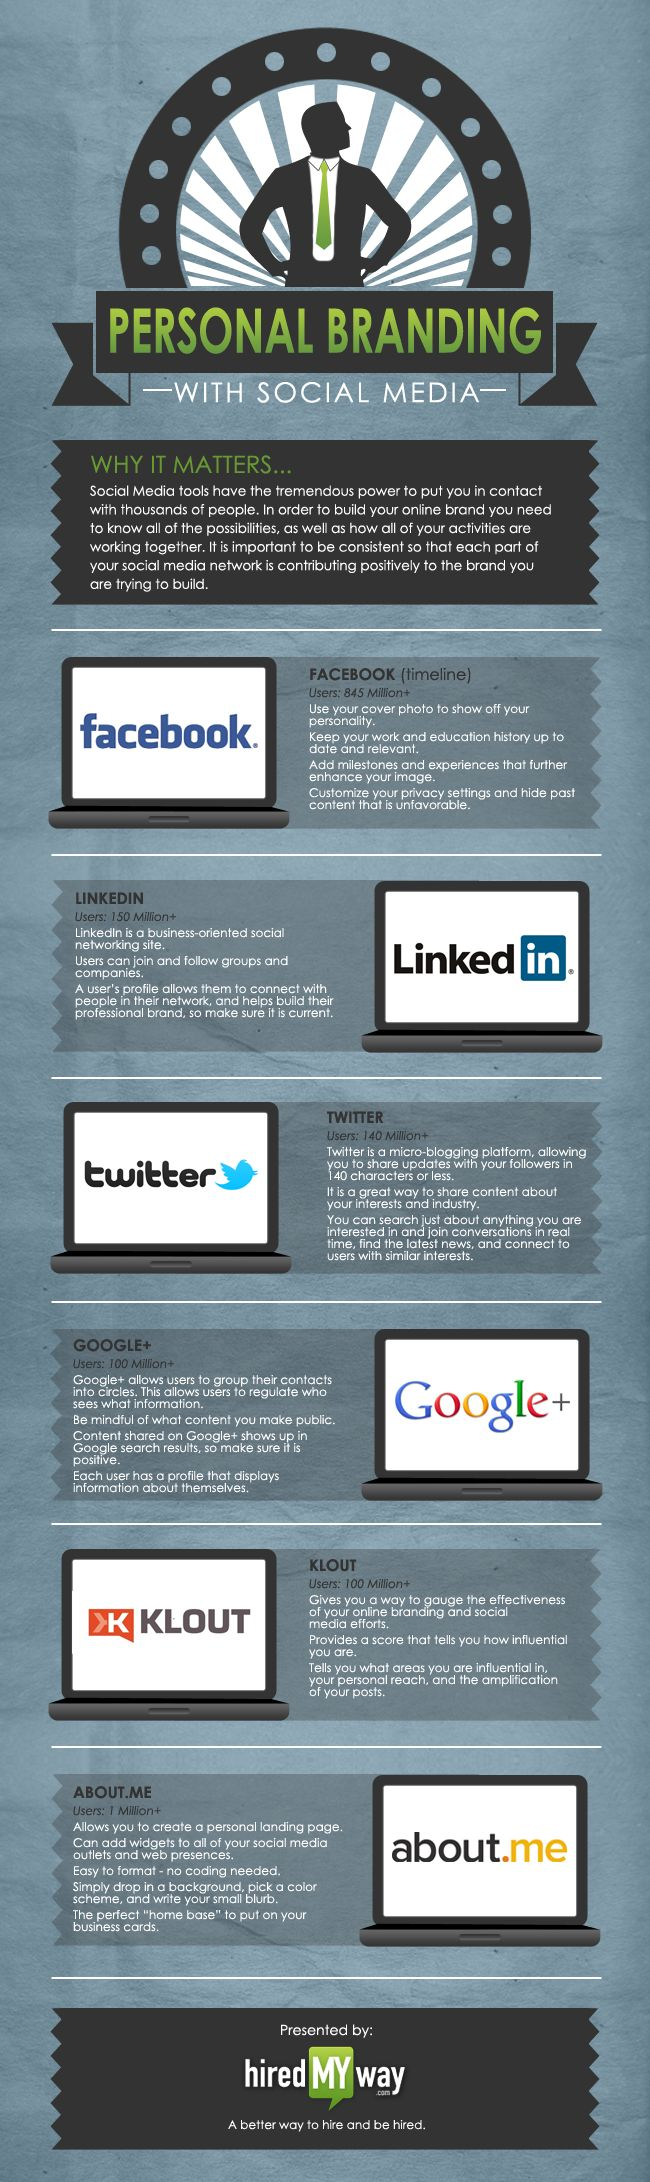 personal branding and social media platforms